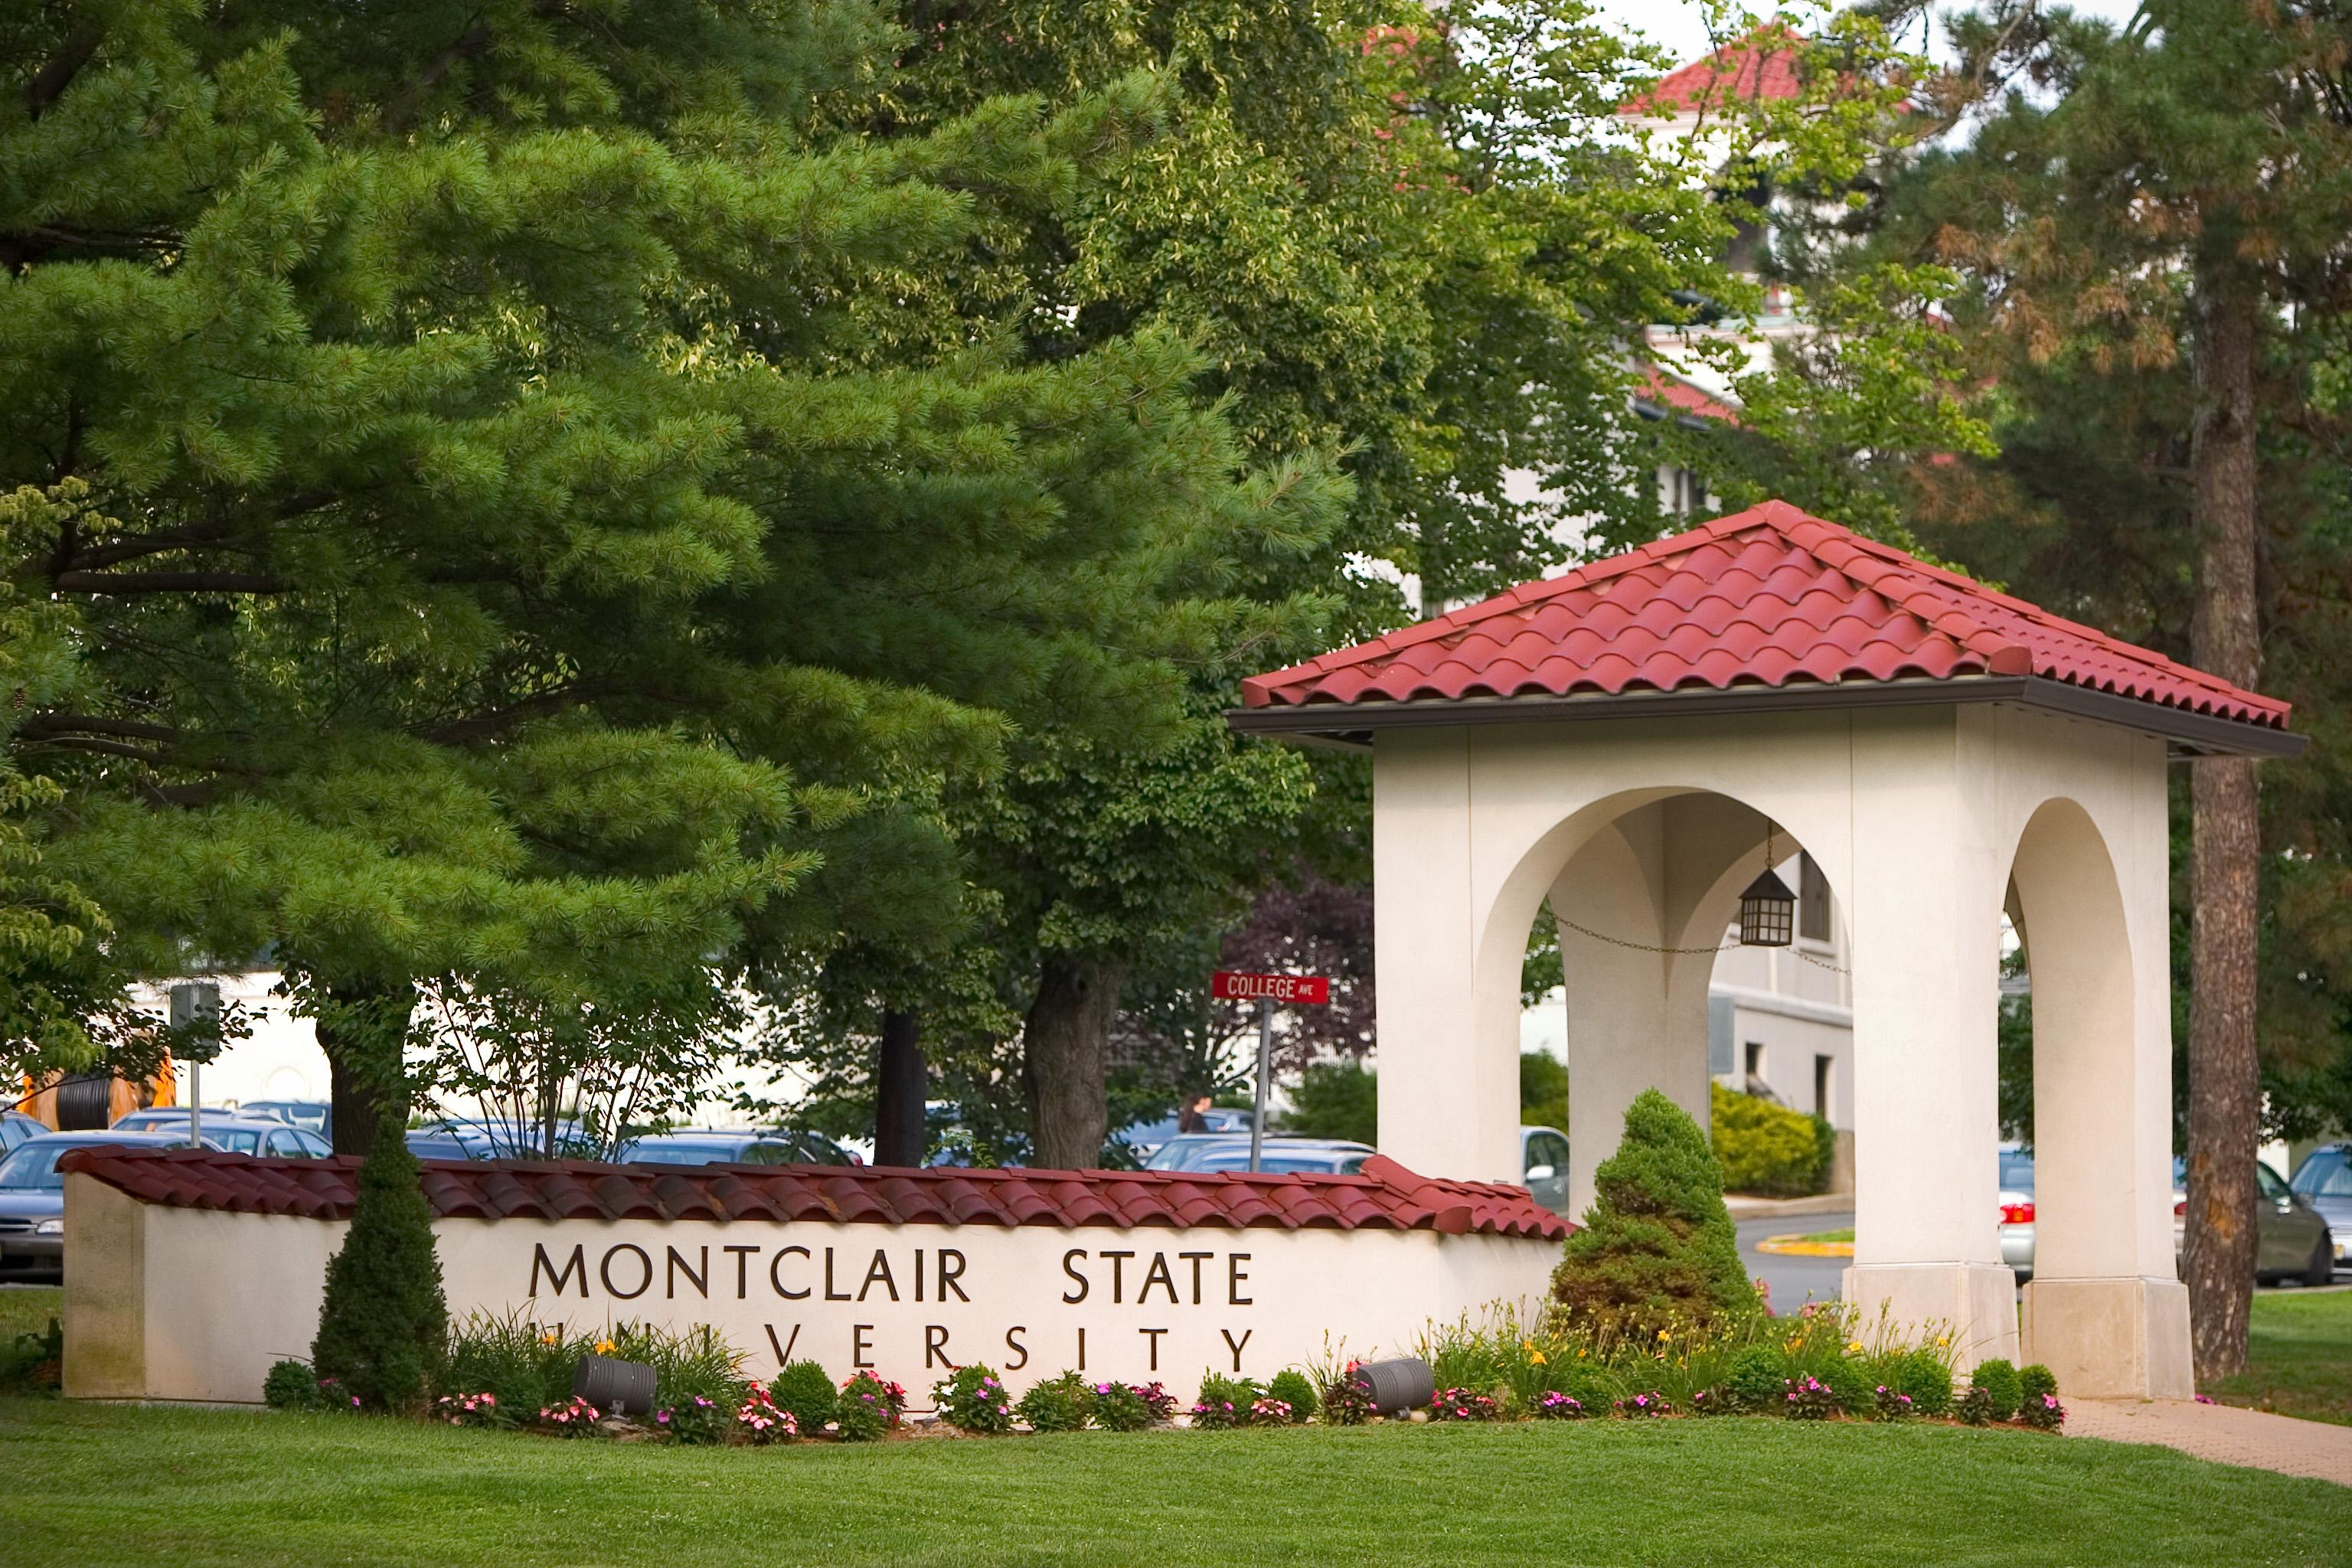 montclair_state.jpg